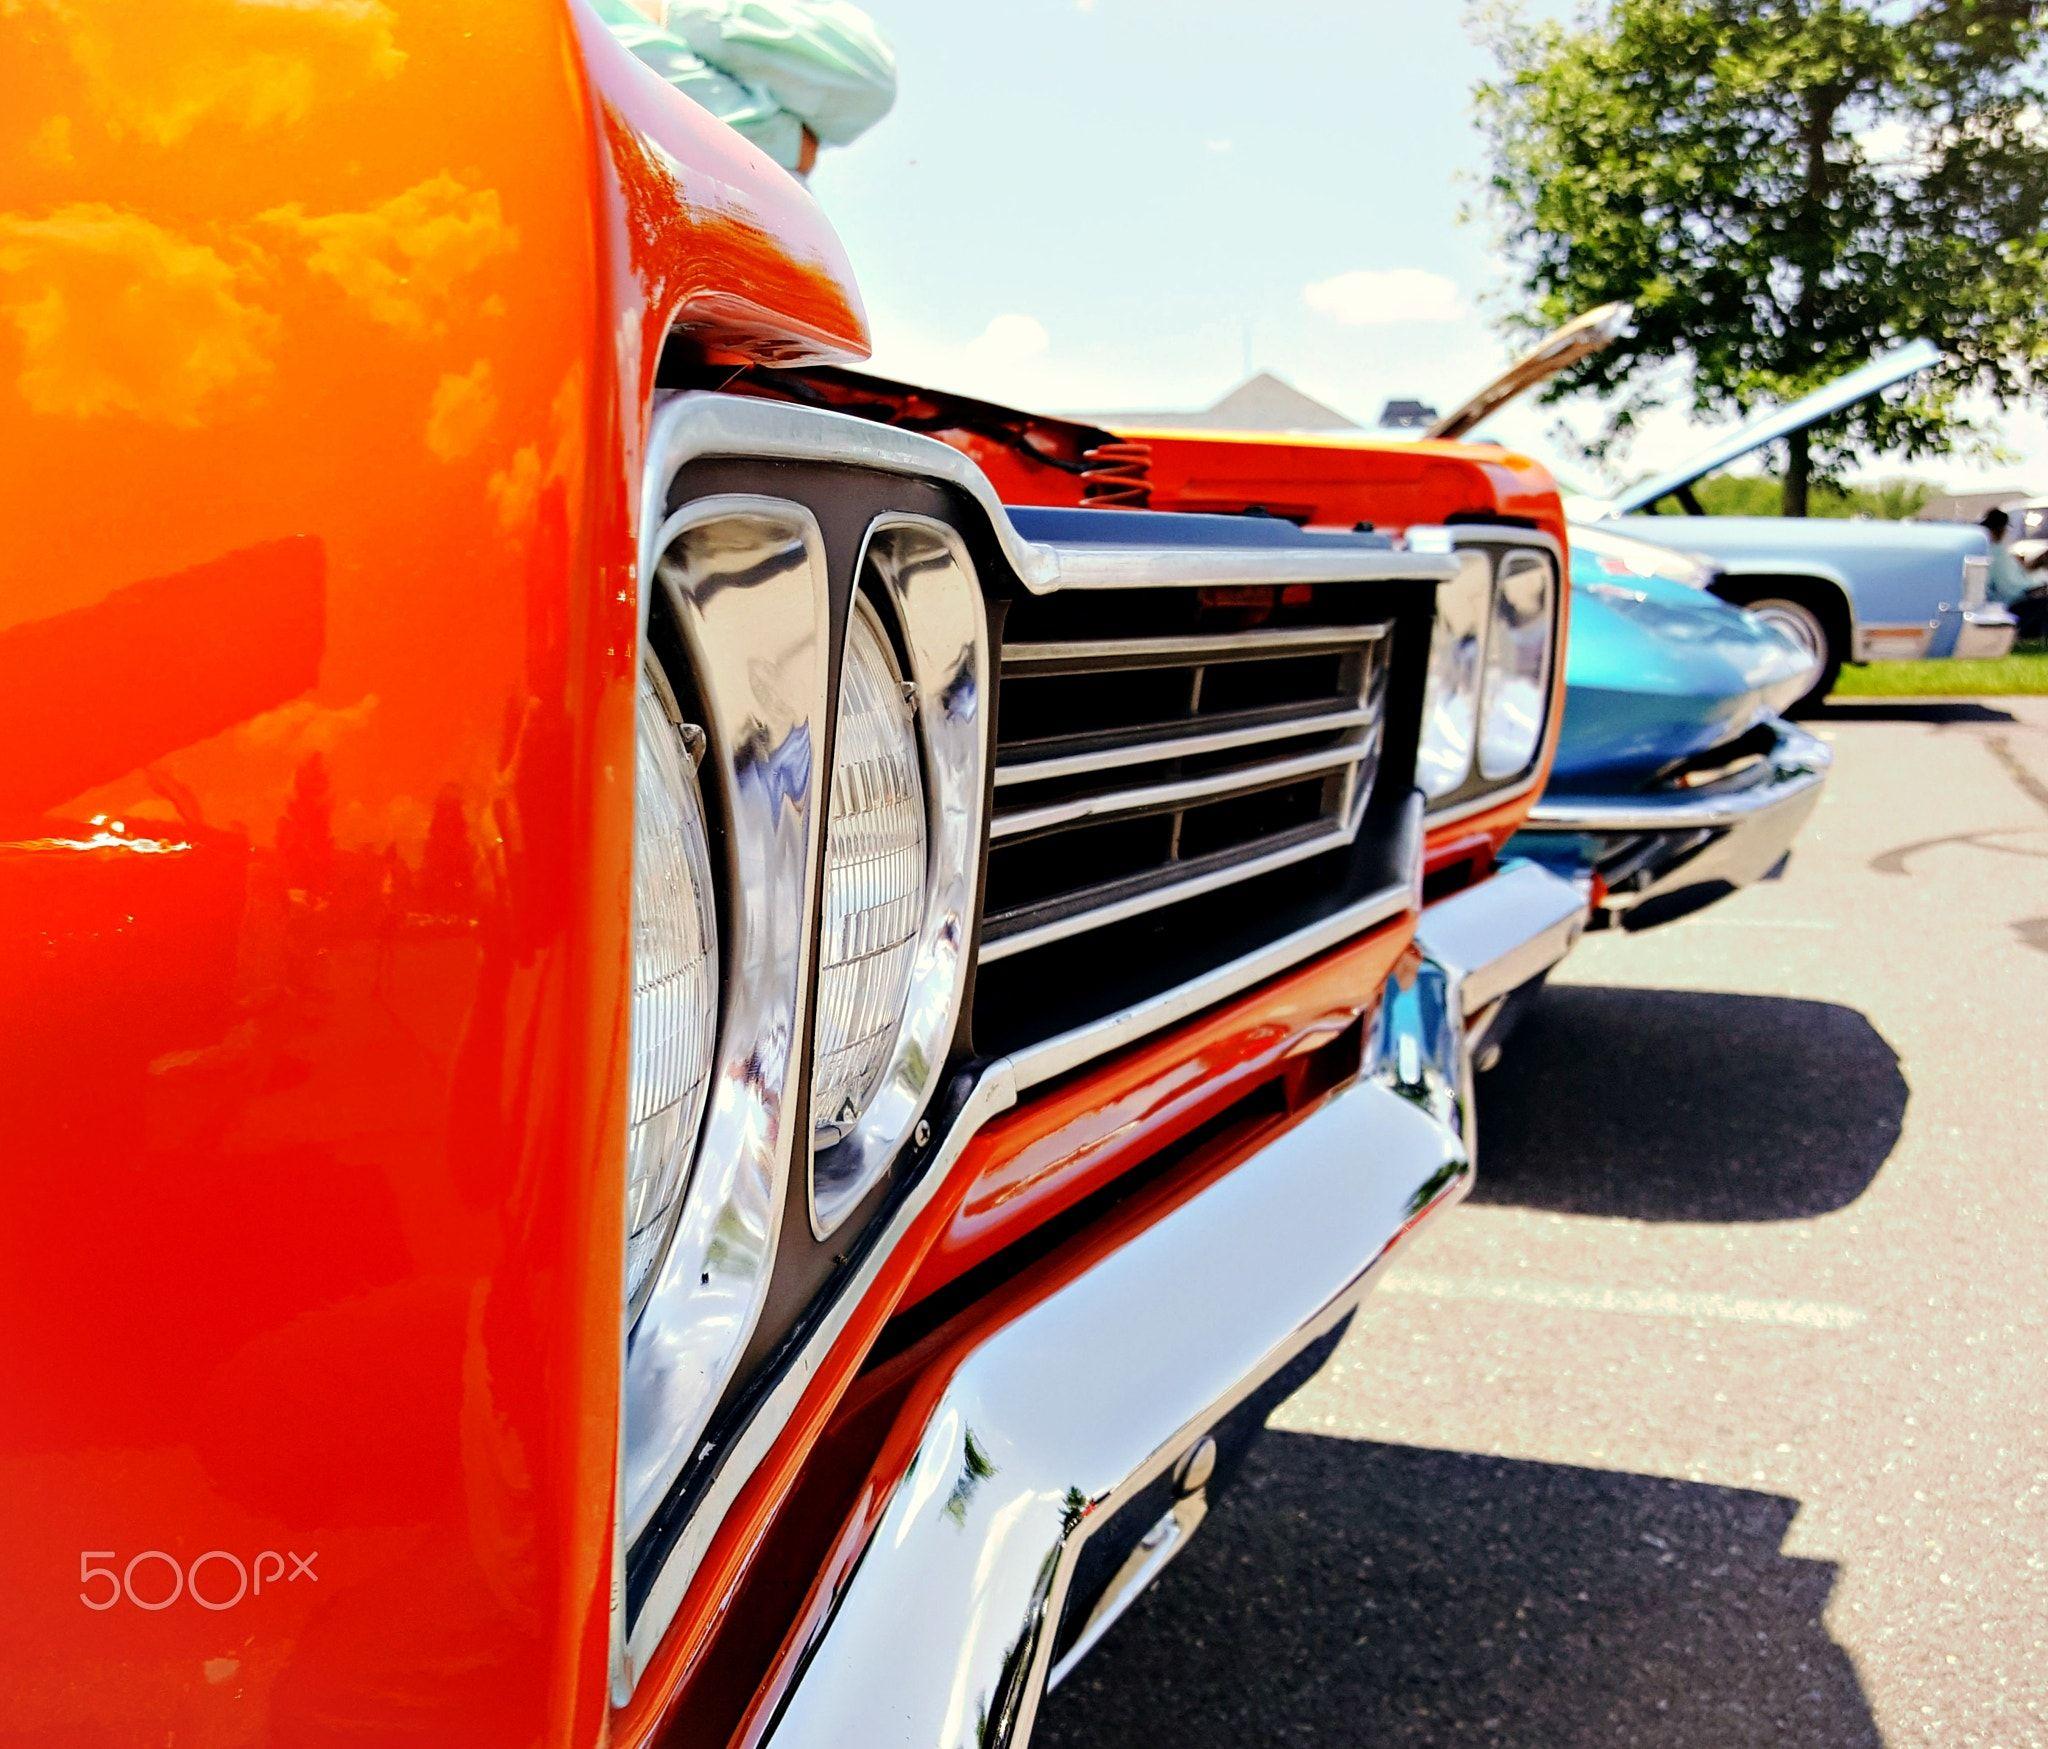 Orange muscle car front end / Delaware car show - Antique/vintage ...